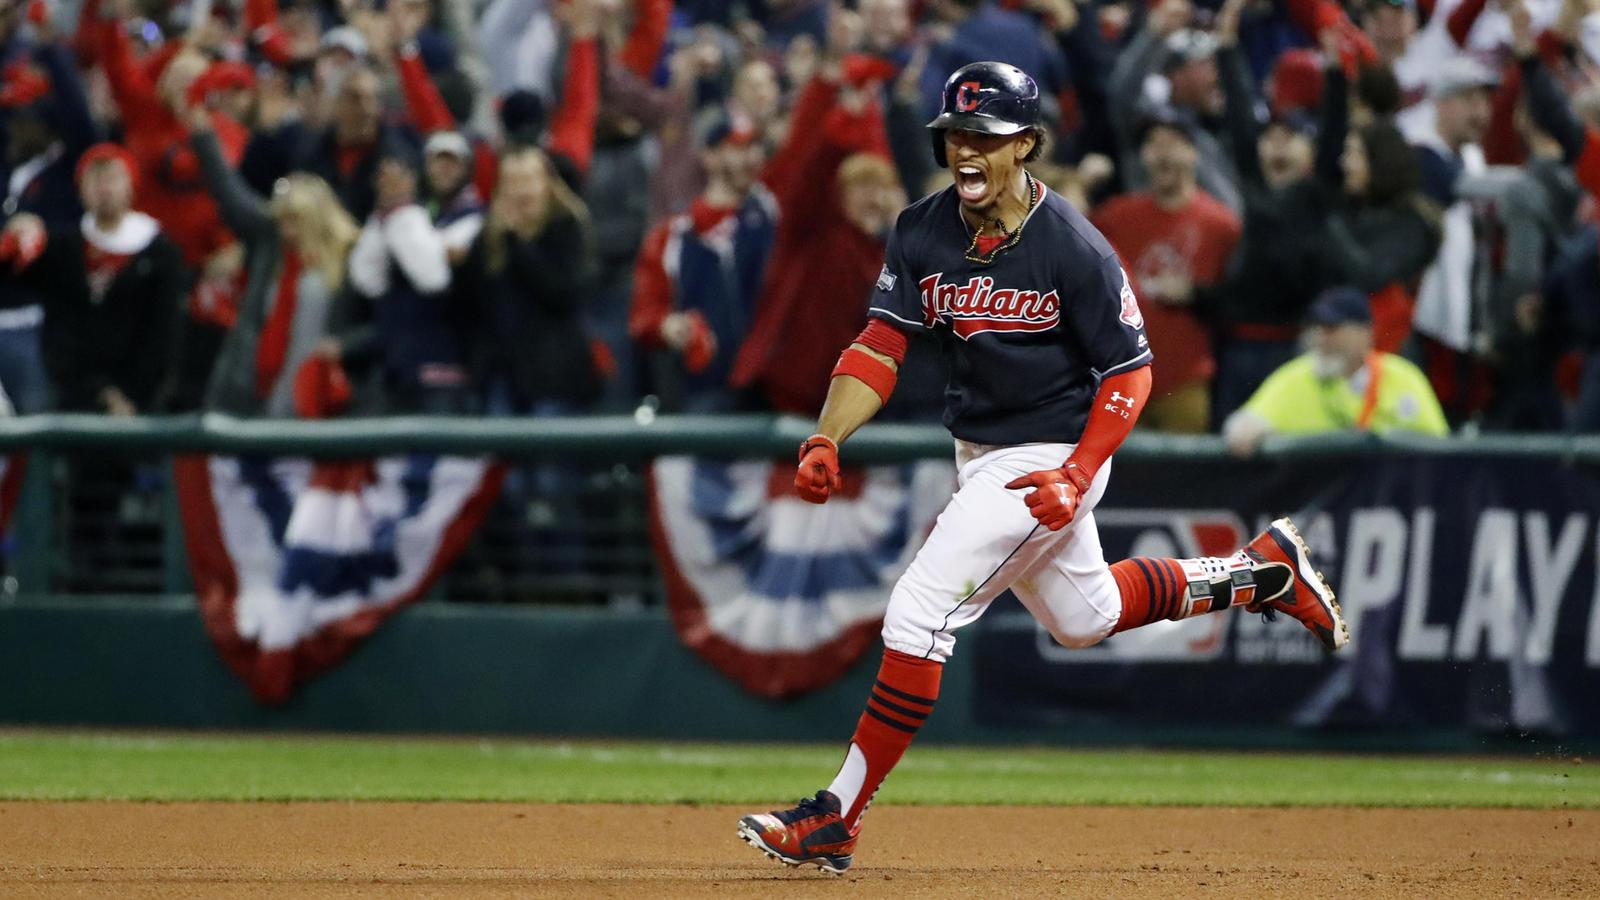 2019 Cleveland Indians: Let's Enjoy It